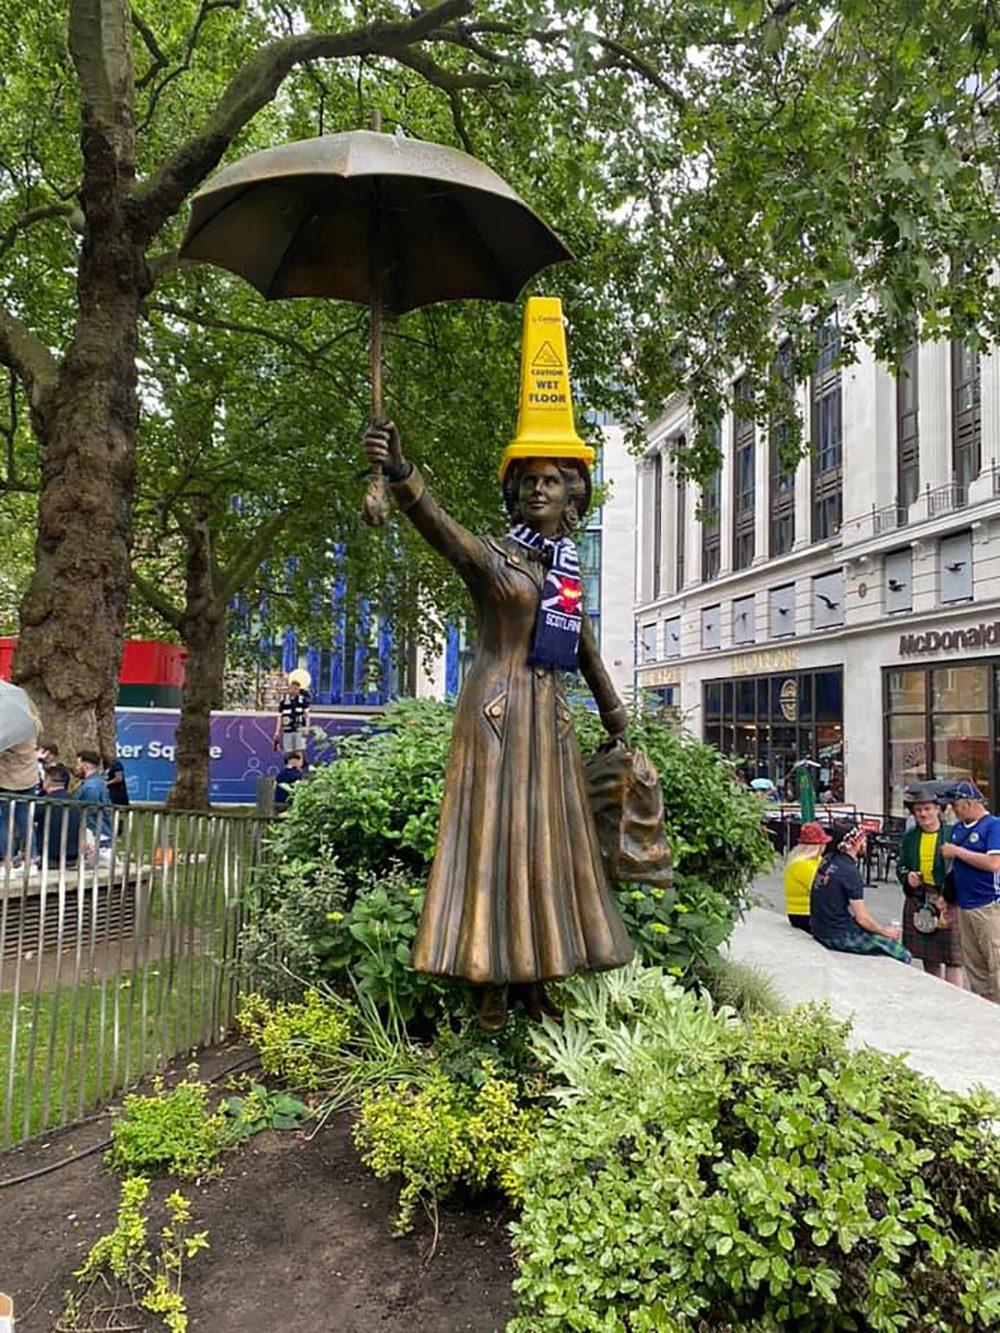 Mary Poppins with Scottish Bottle   Scottish News